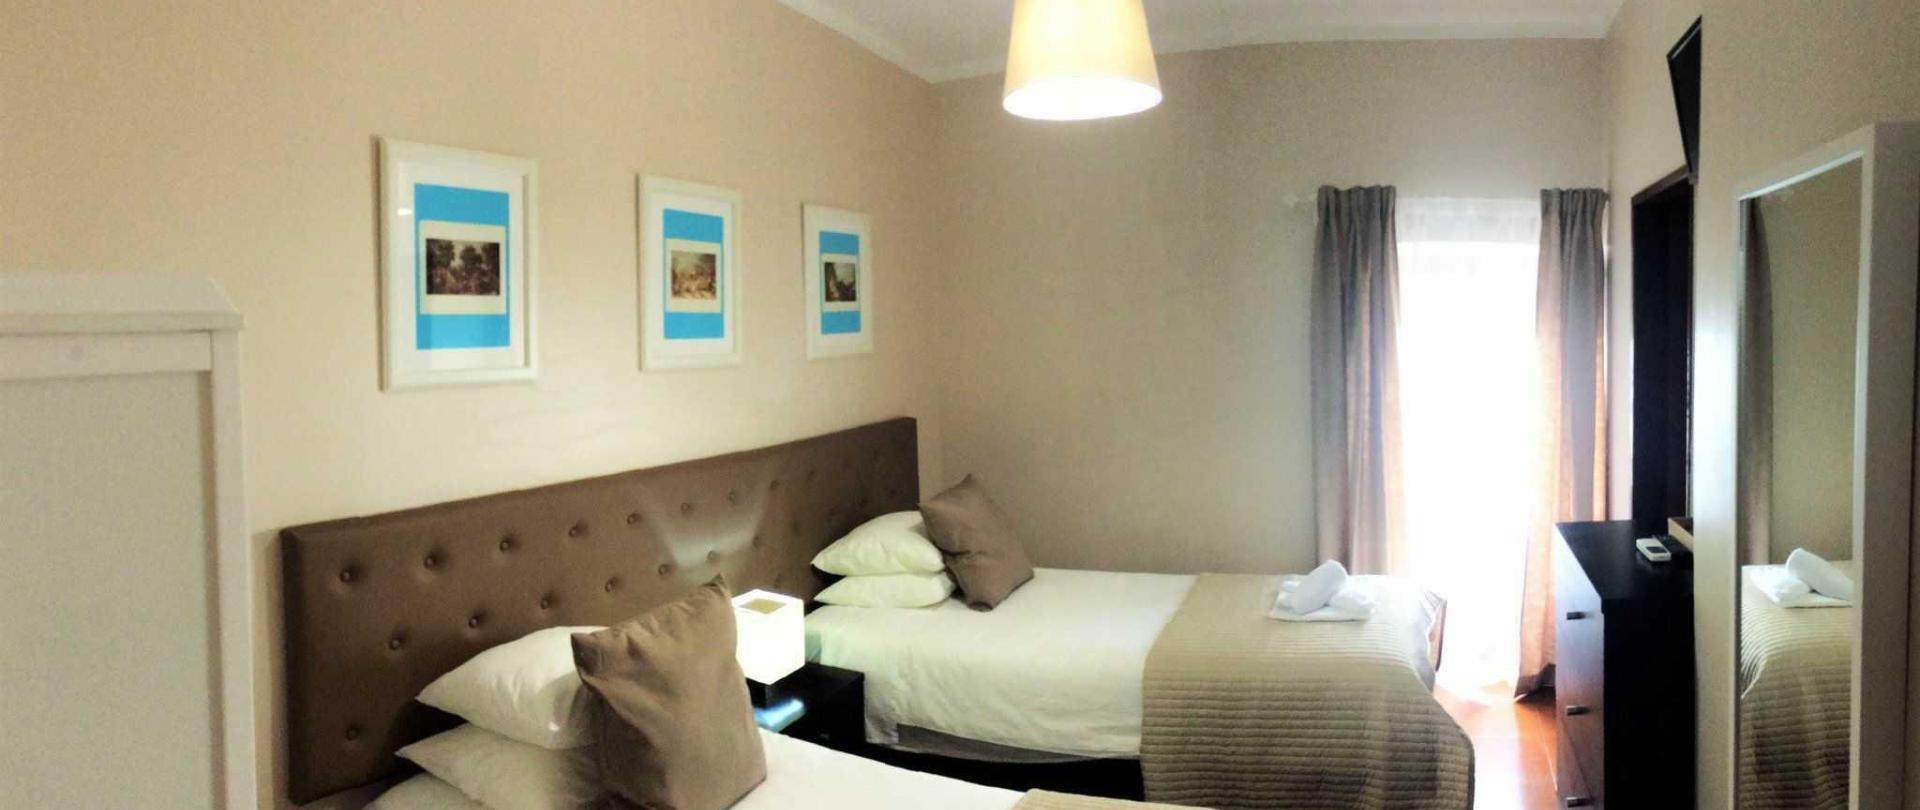 room-3-2.jpg